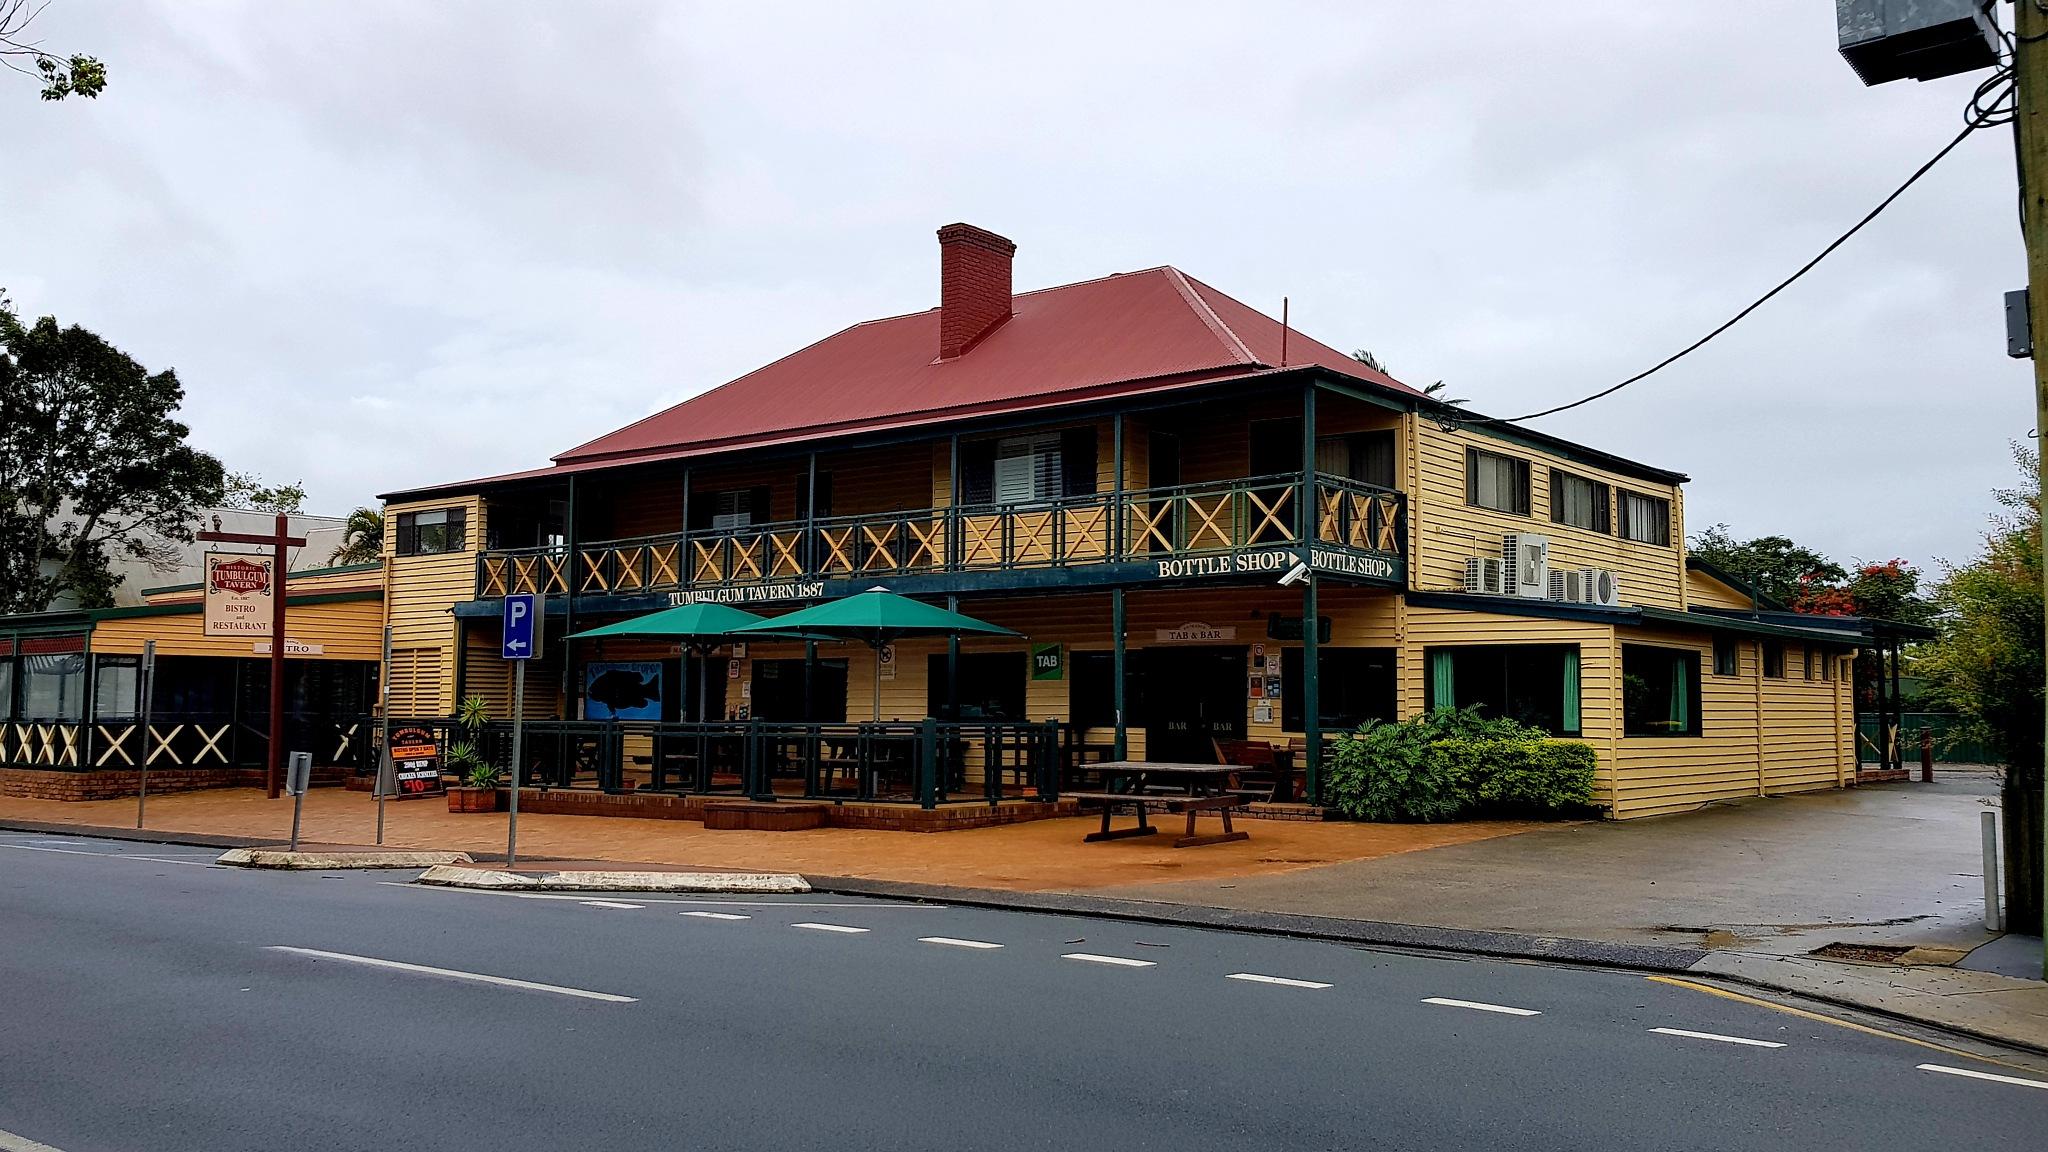 Tumblegum tavern 1887 NSW  by Michael De St Pern